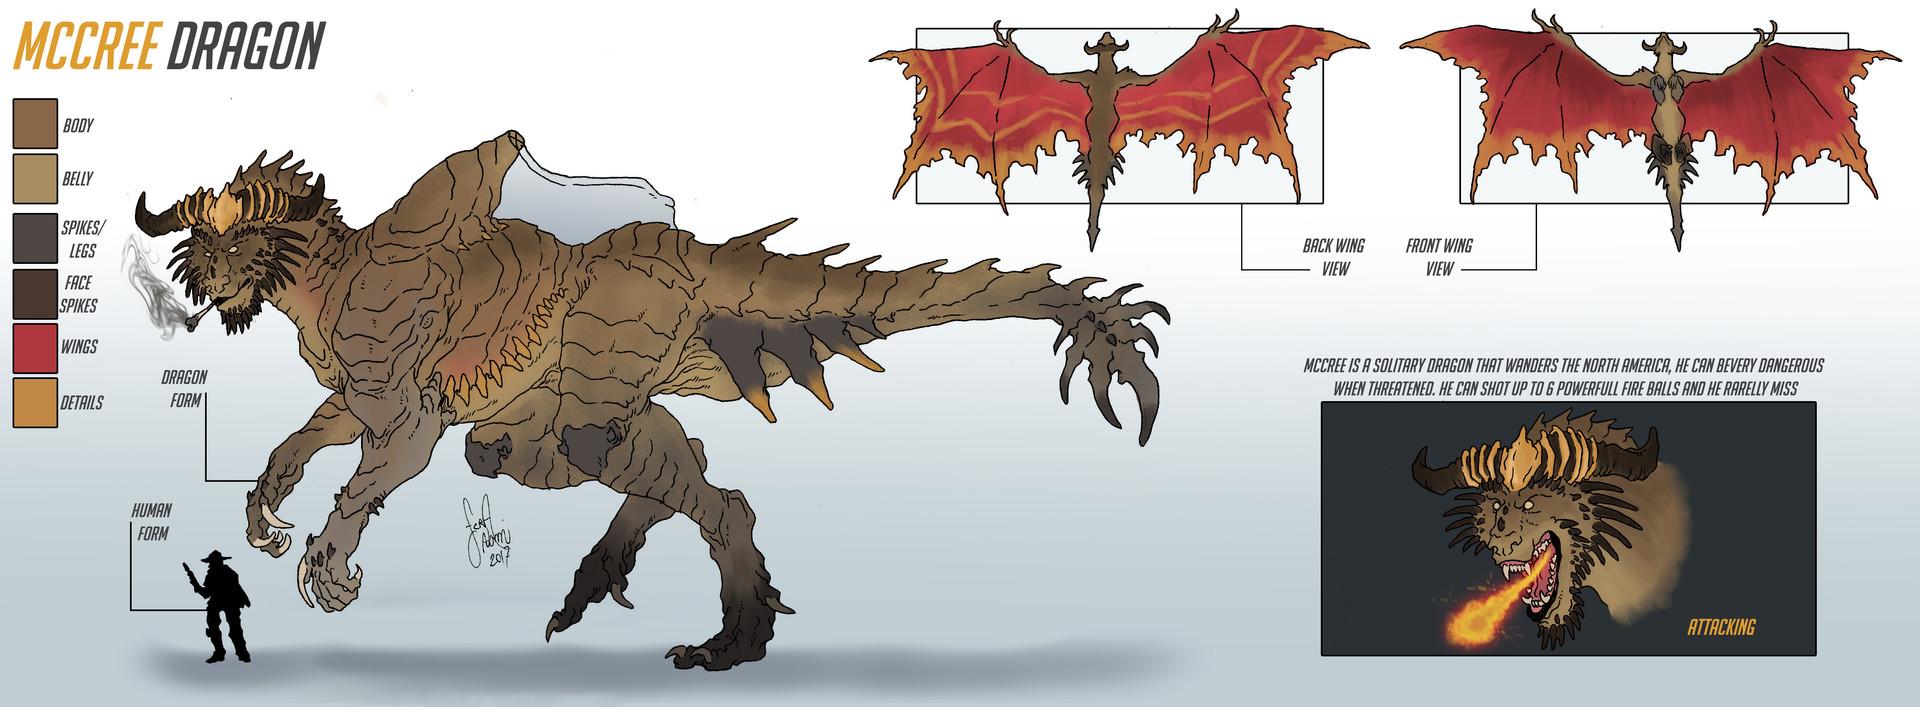 fernanda adami - overwatch dragons